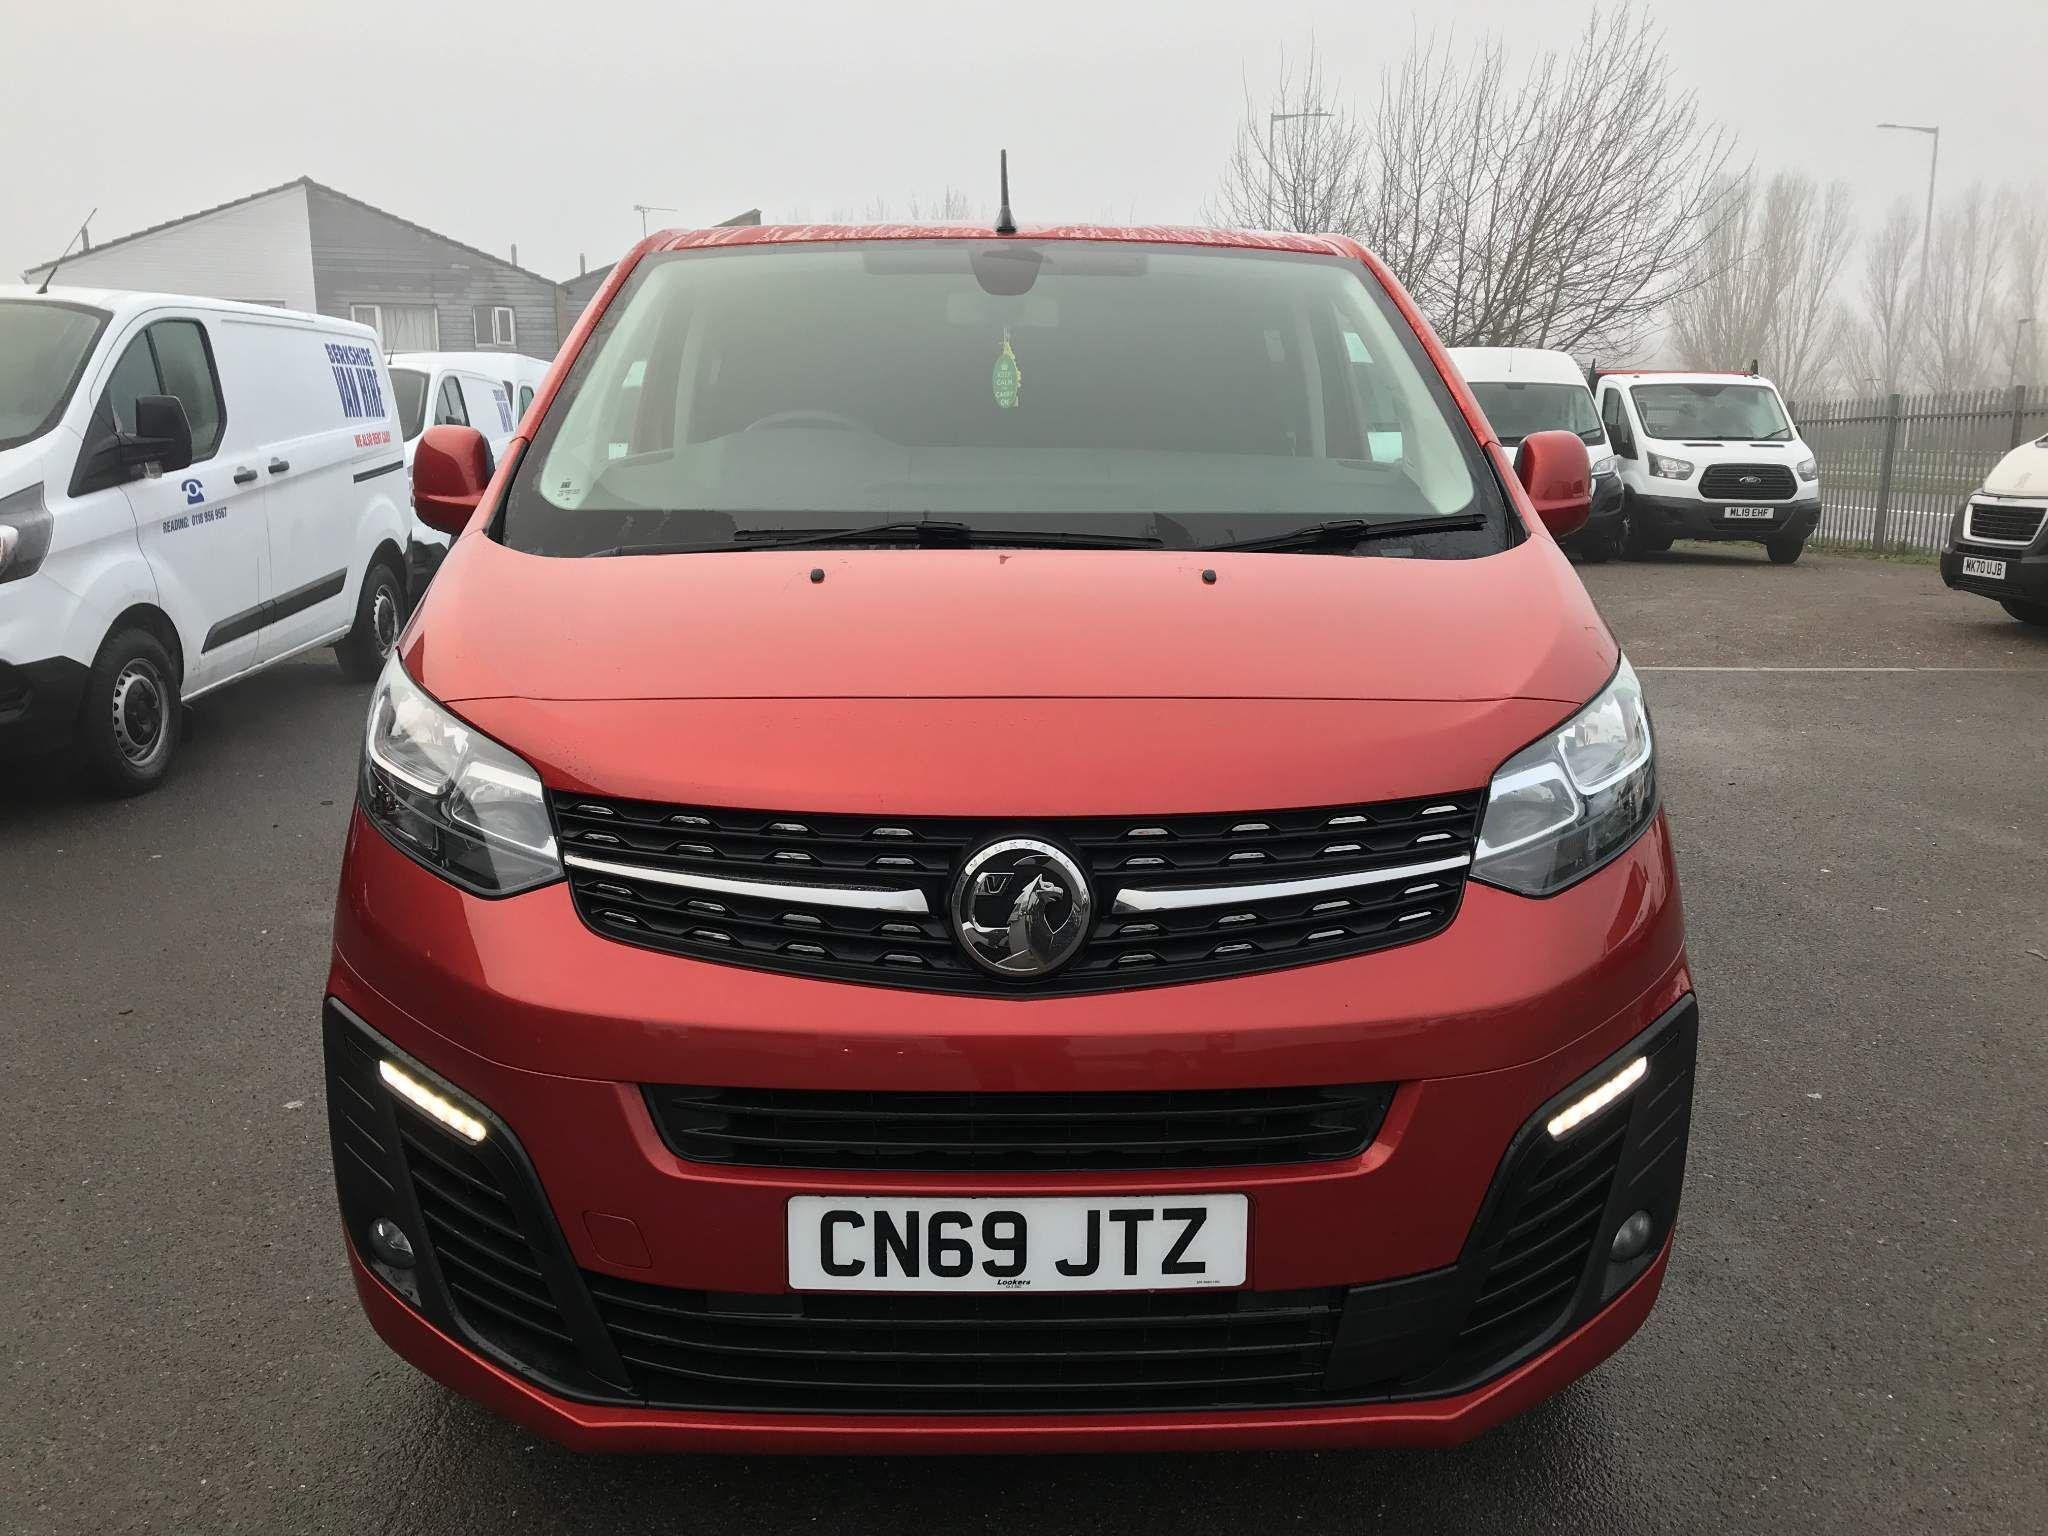 VauxhallVivaro 2.0 Turbo Crew VanCrew Van EU6 2 For Sale